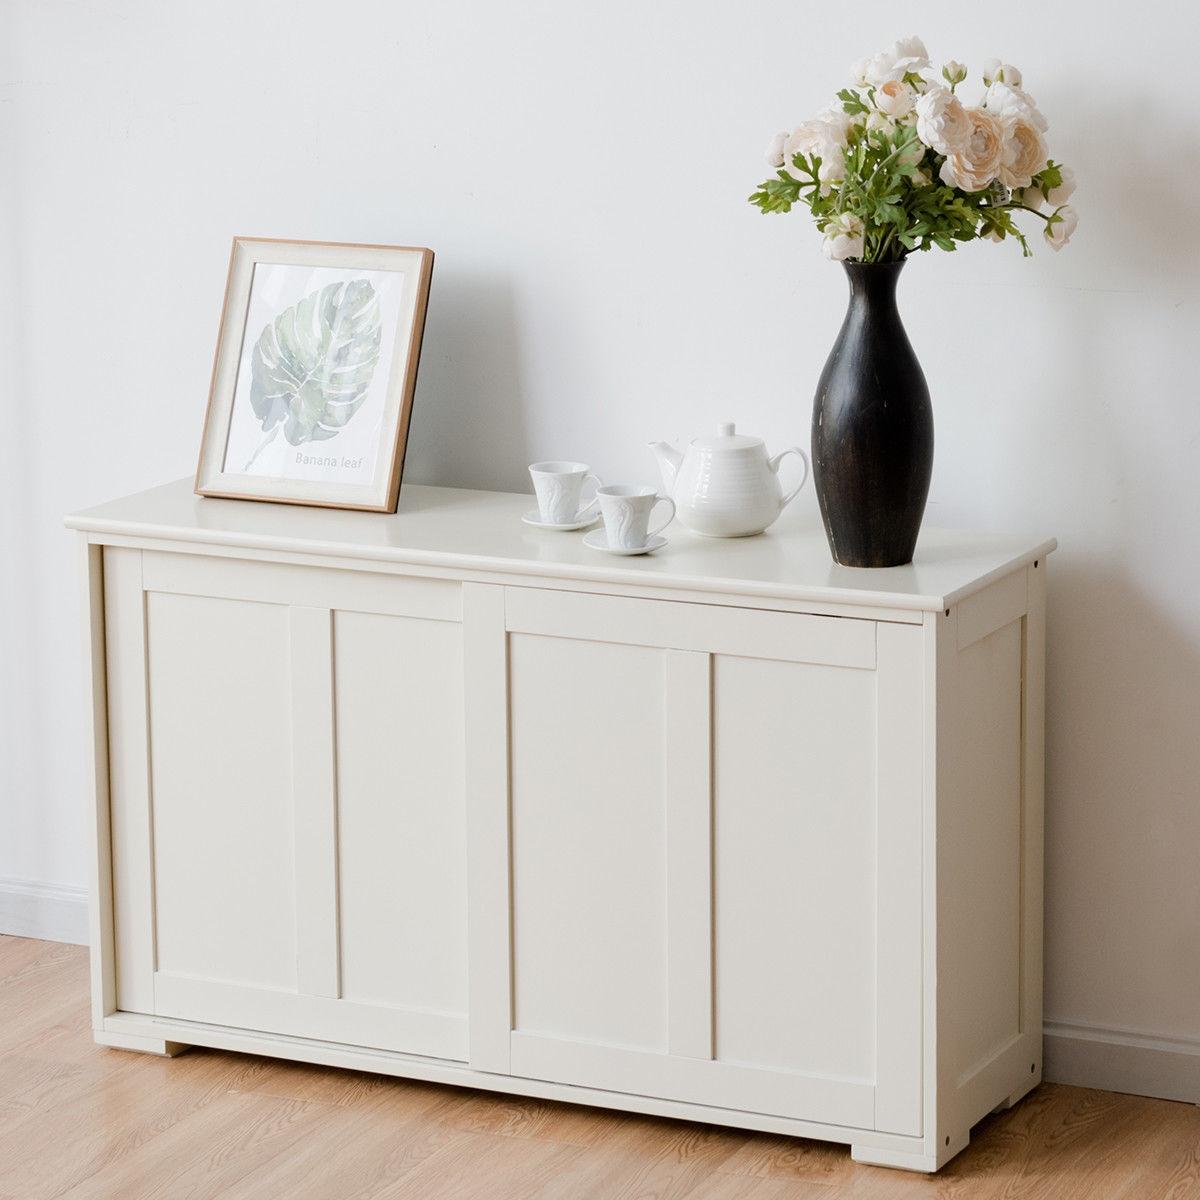 Kitchen Storage Cabinet with Wood Sliding Door